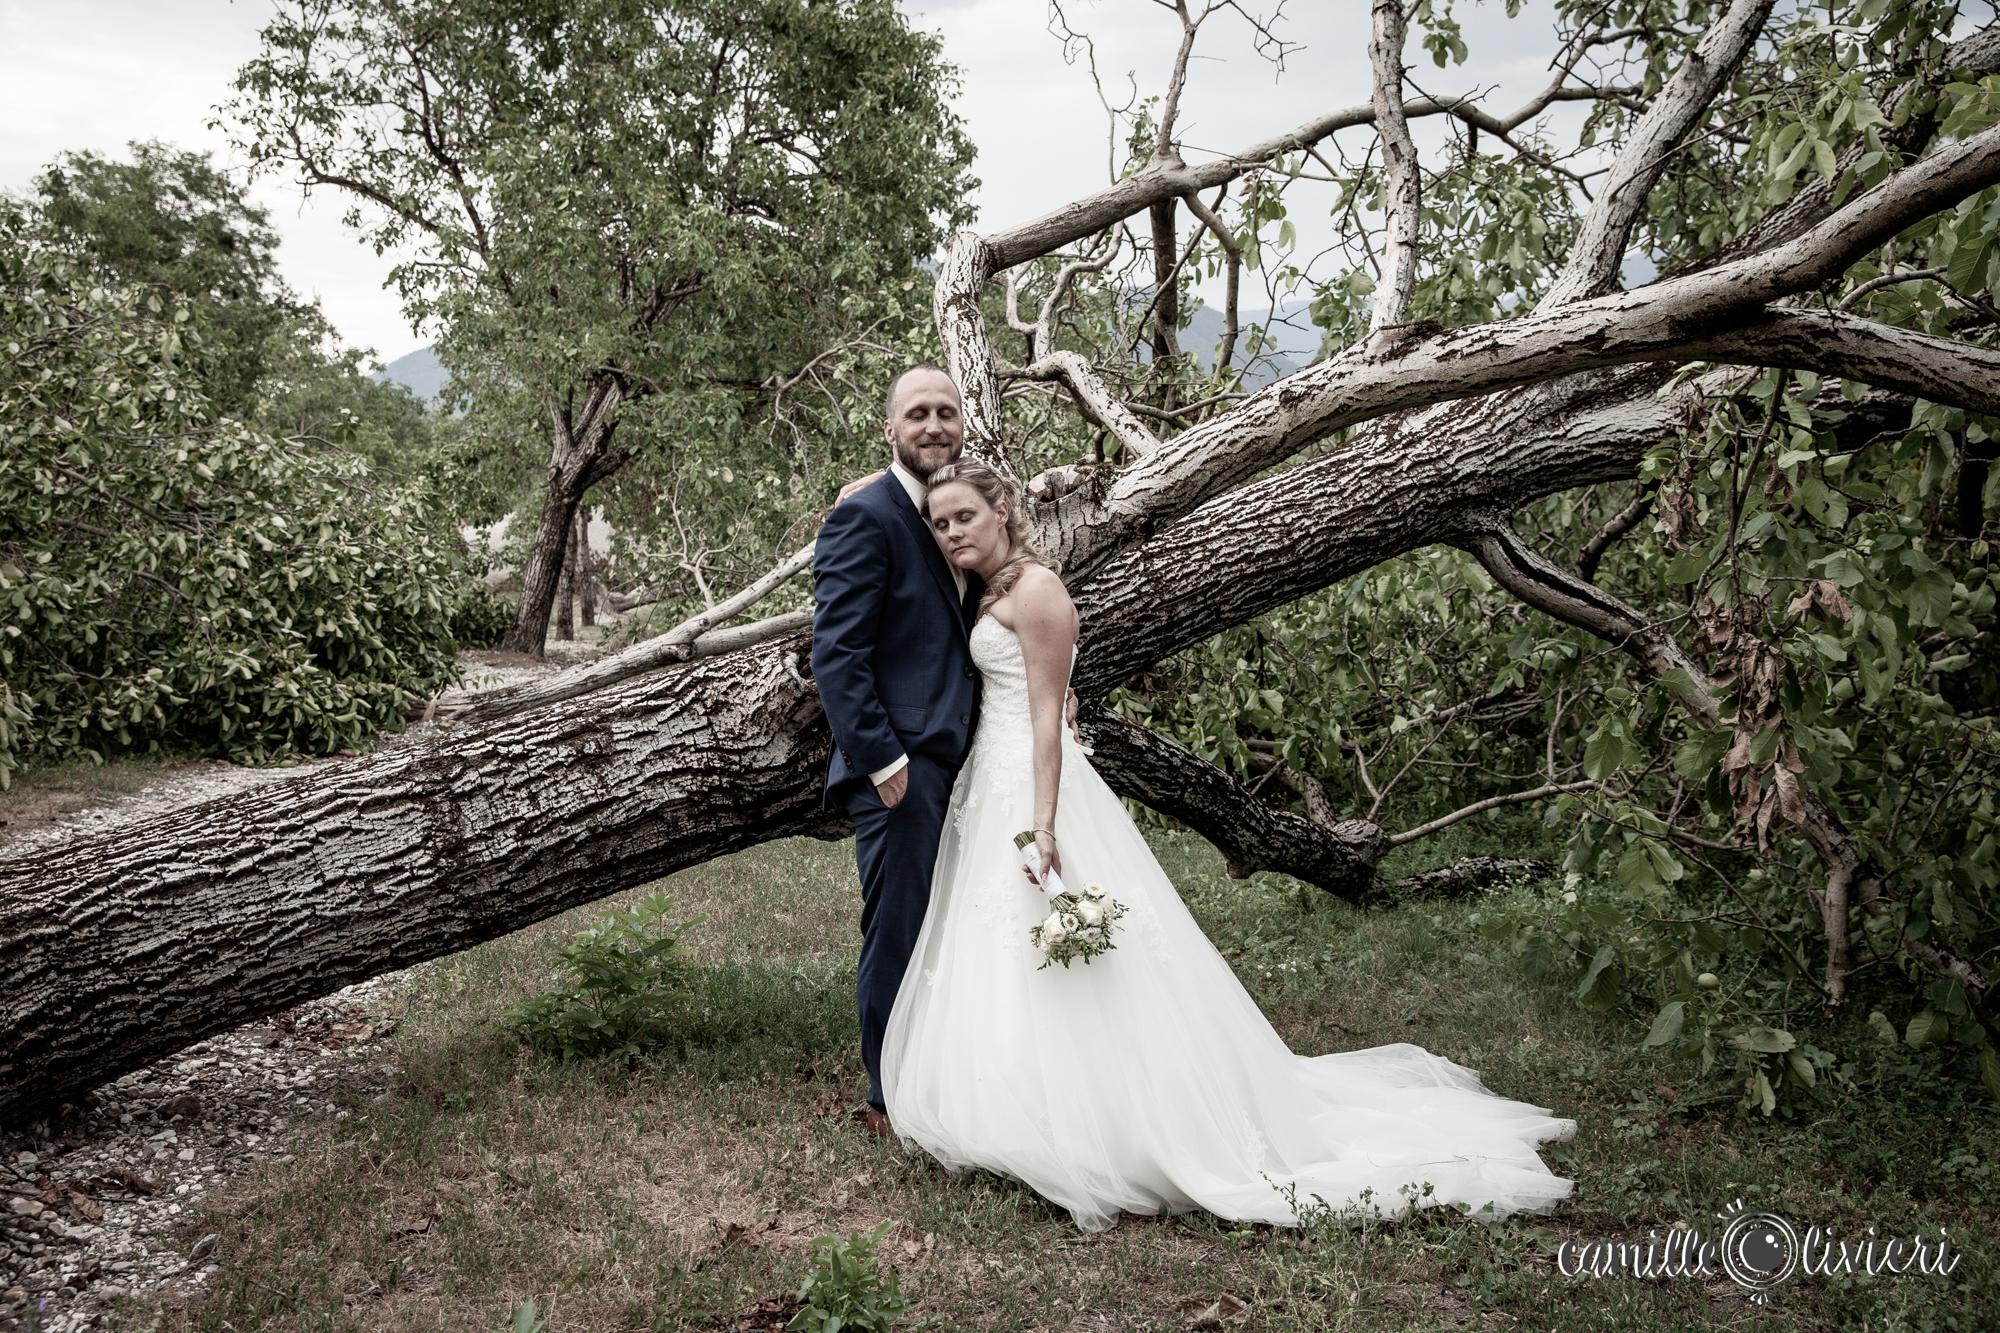 photographe_grenoble_mariage-camille-olivieri-117